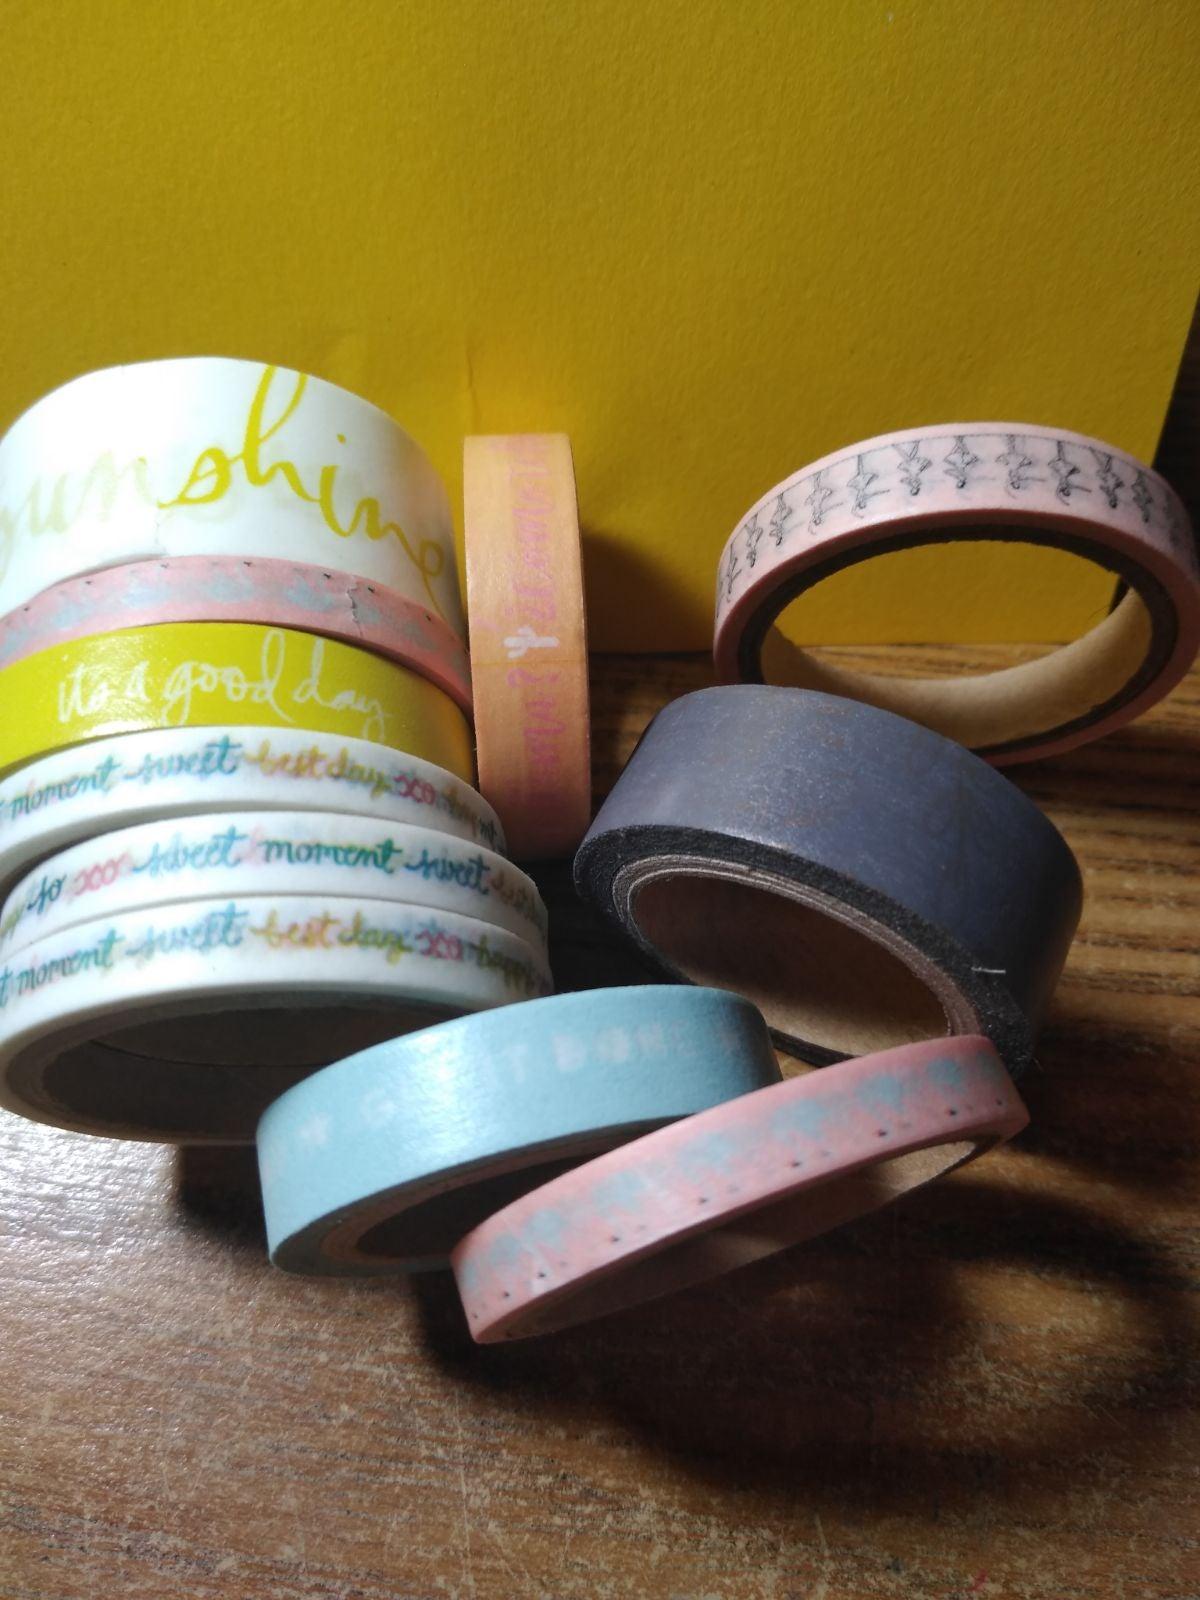 11 rolls of washi tape